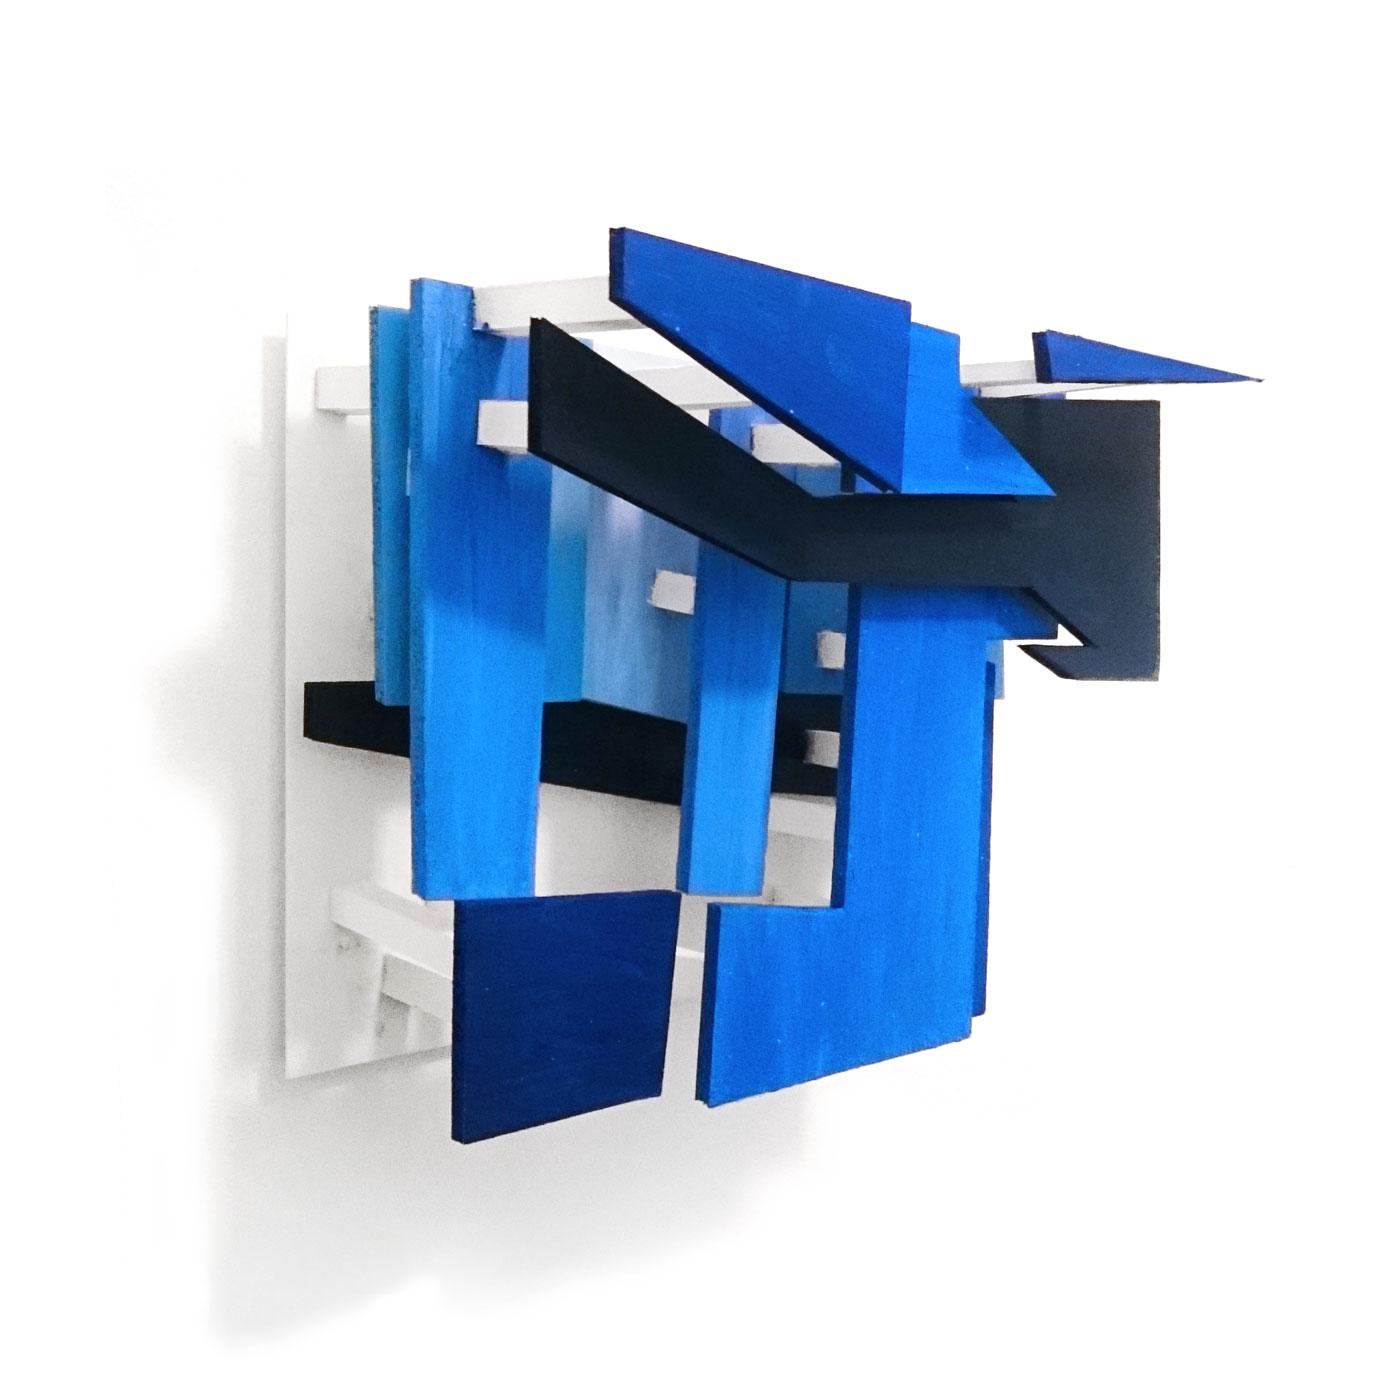 INSIDE CHILLIDA I, © 2015,  polysterol, acrylic paint, 26 x 18 x 12 cm